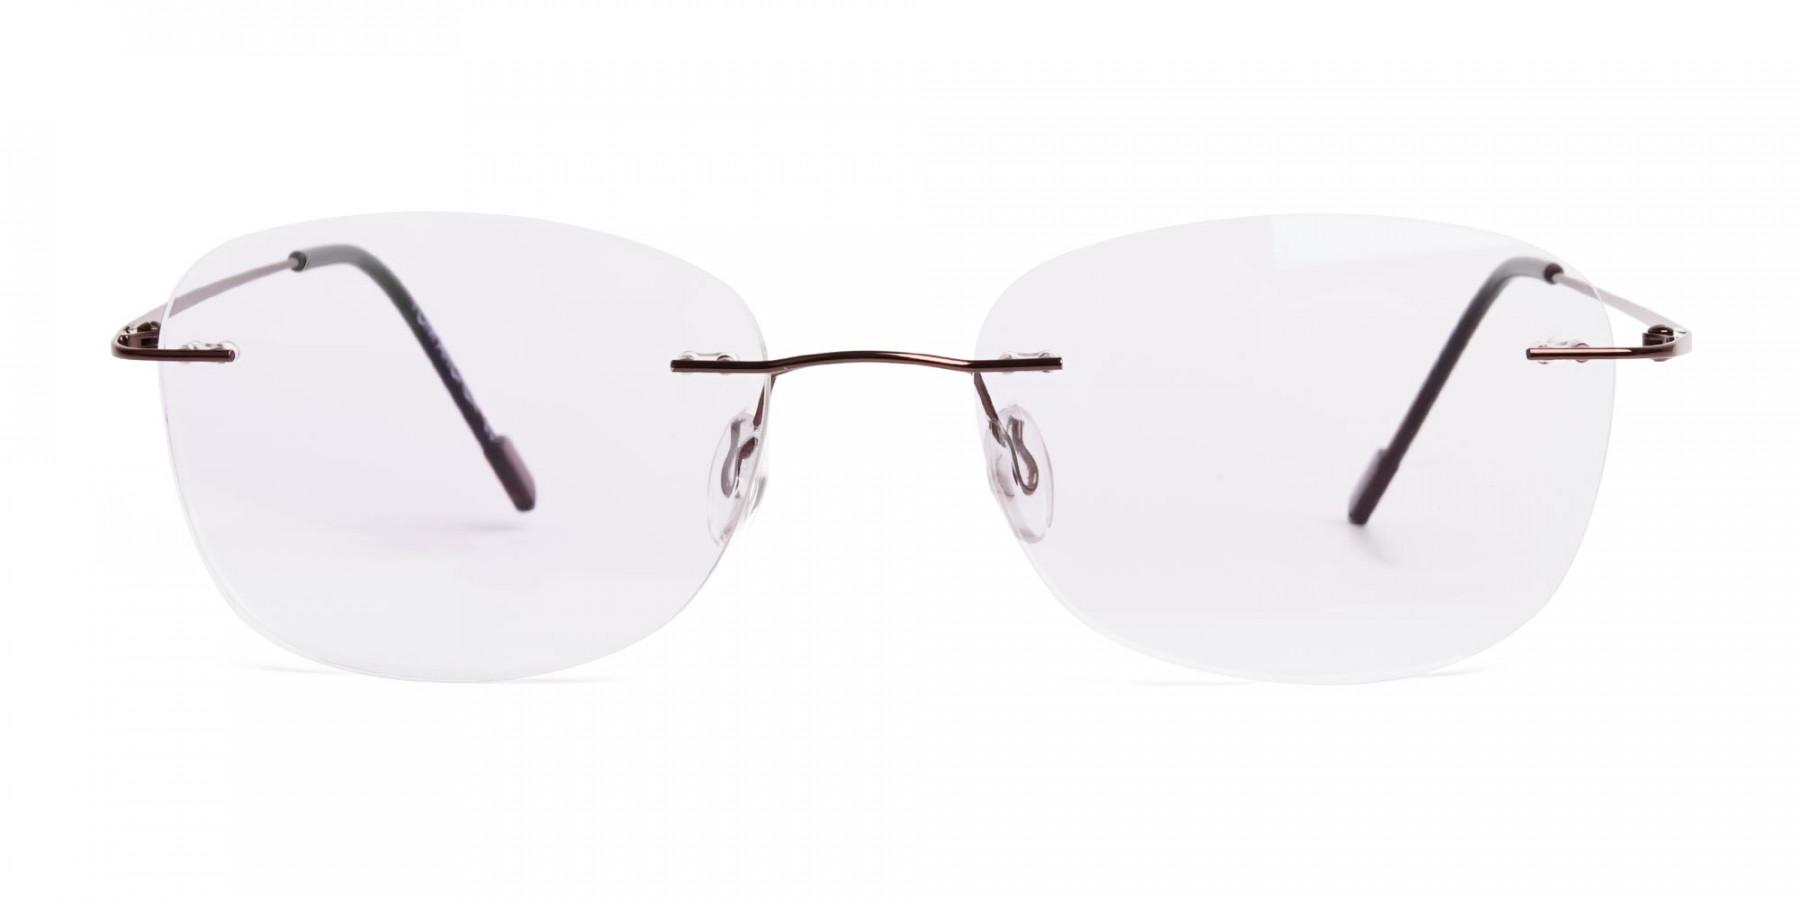 brown-wayfarer-rimless-glasses-frames-1